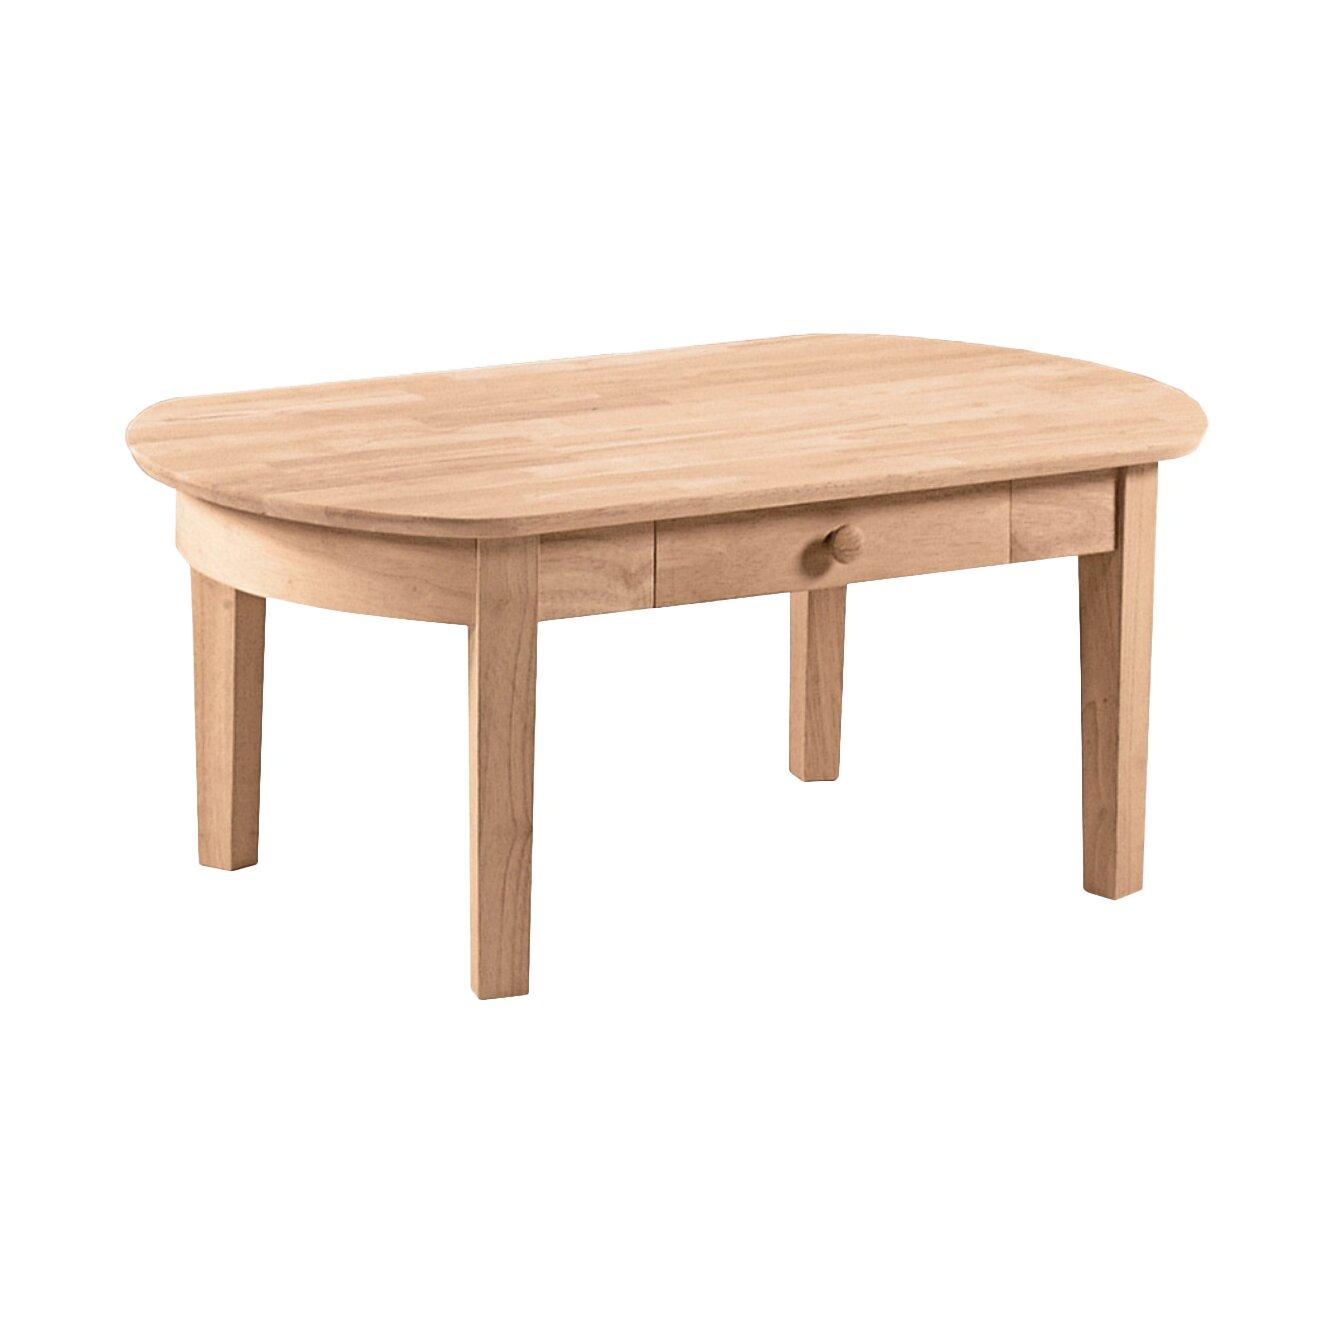 Unfinished wood philips coffee table wayfair for Unfinished coffee table